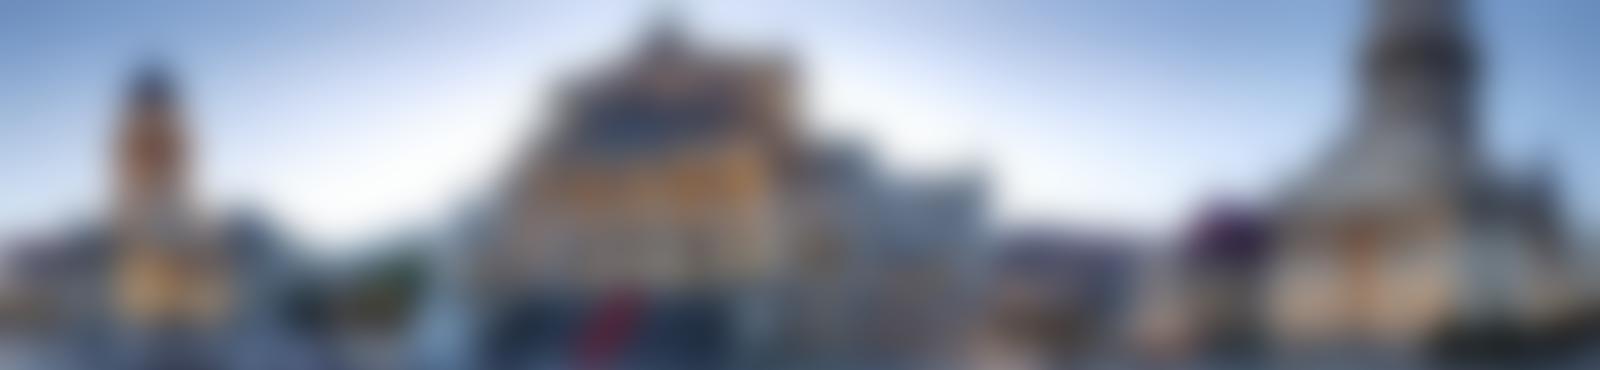 Blurred fa535dc7 89e5 43b1 bde7 a5604565f5e3